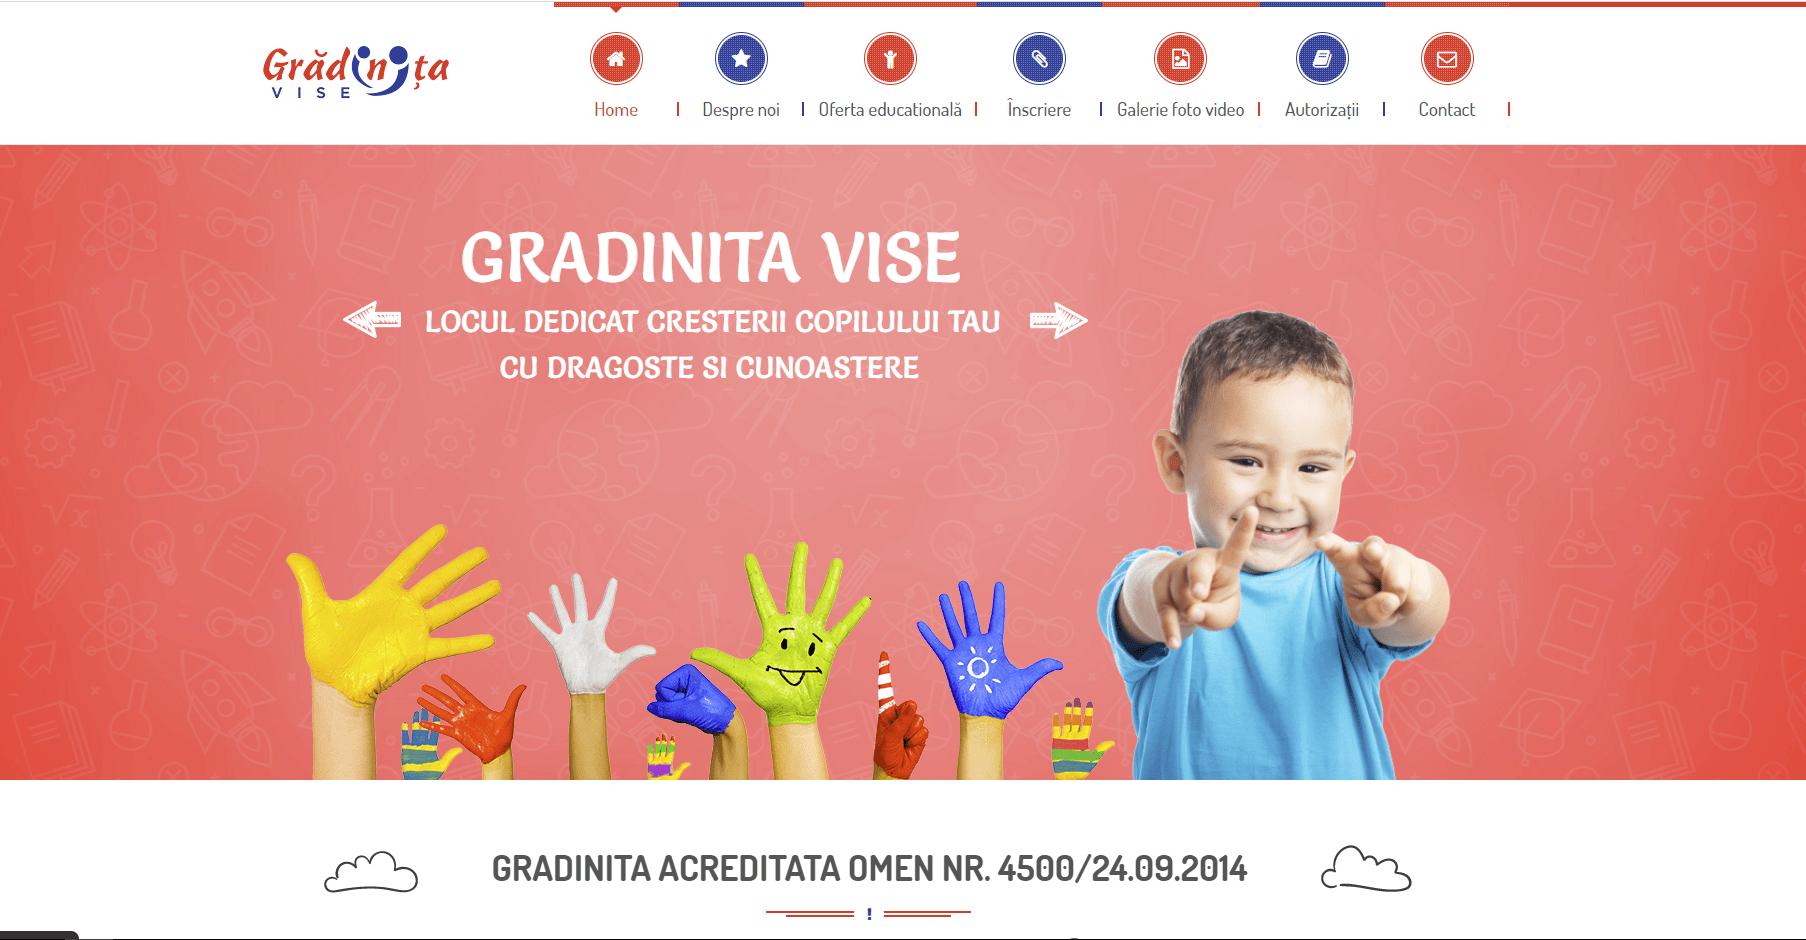 GradinitaVise.ro (2019)